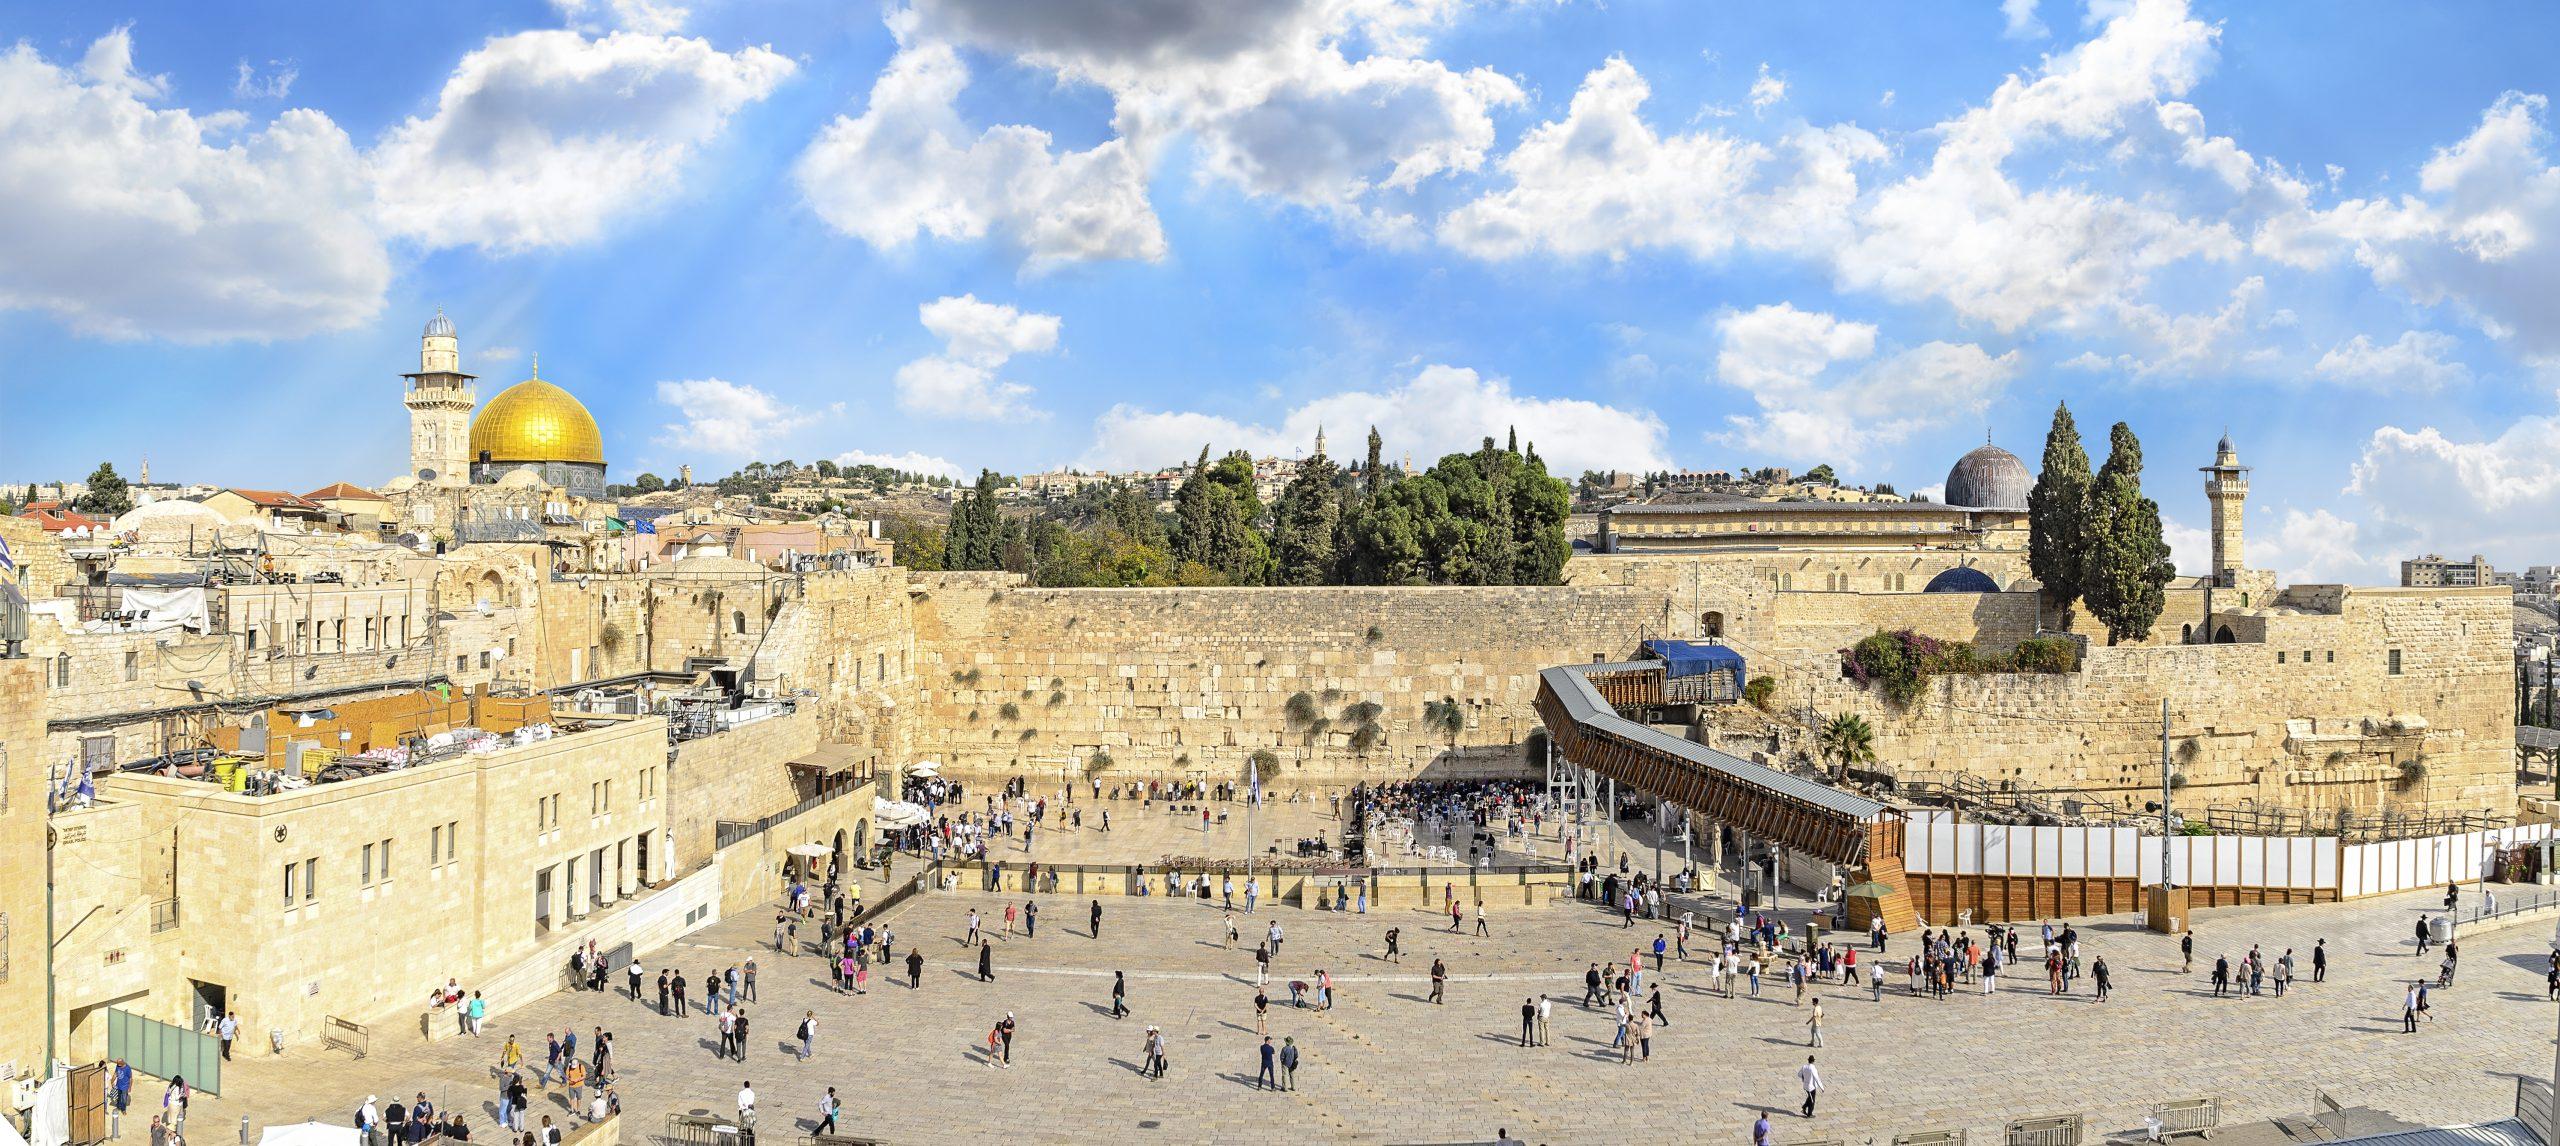 Western Wall On Jerusalem, Dead Sea, Bethlehem Tour